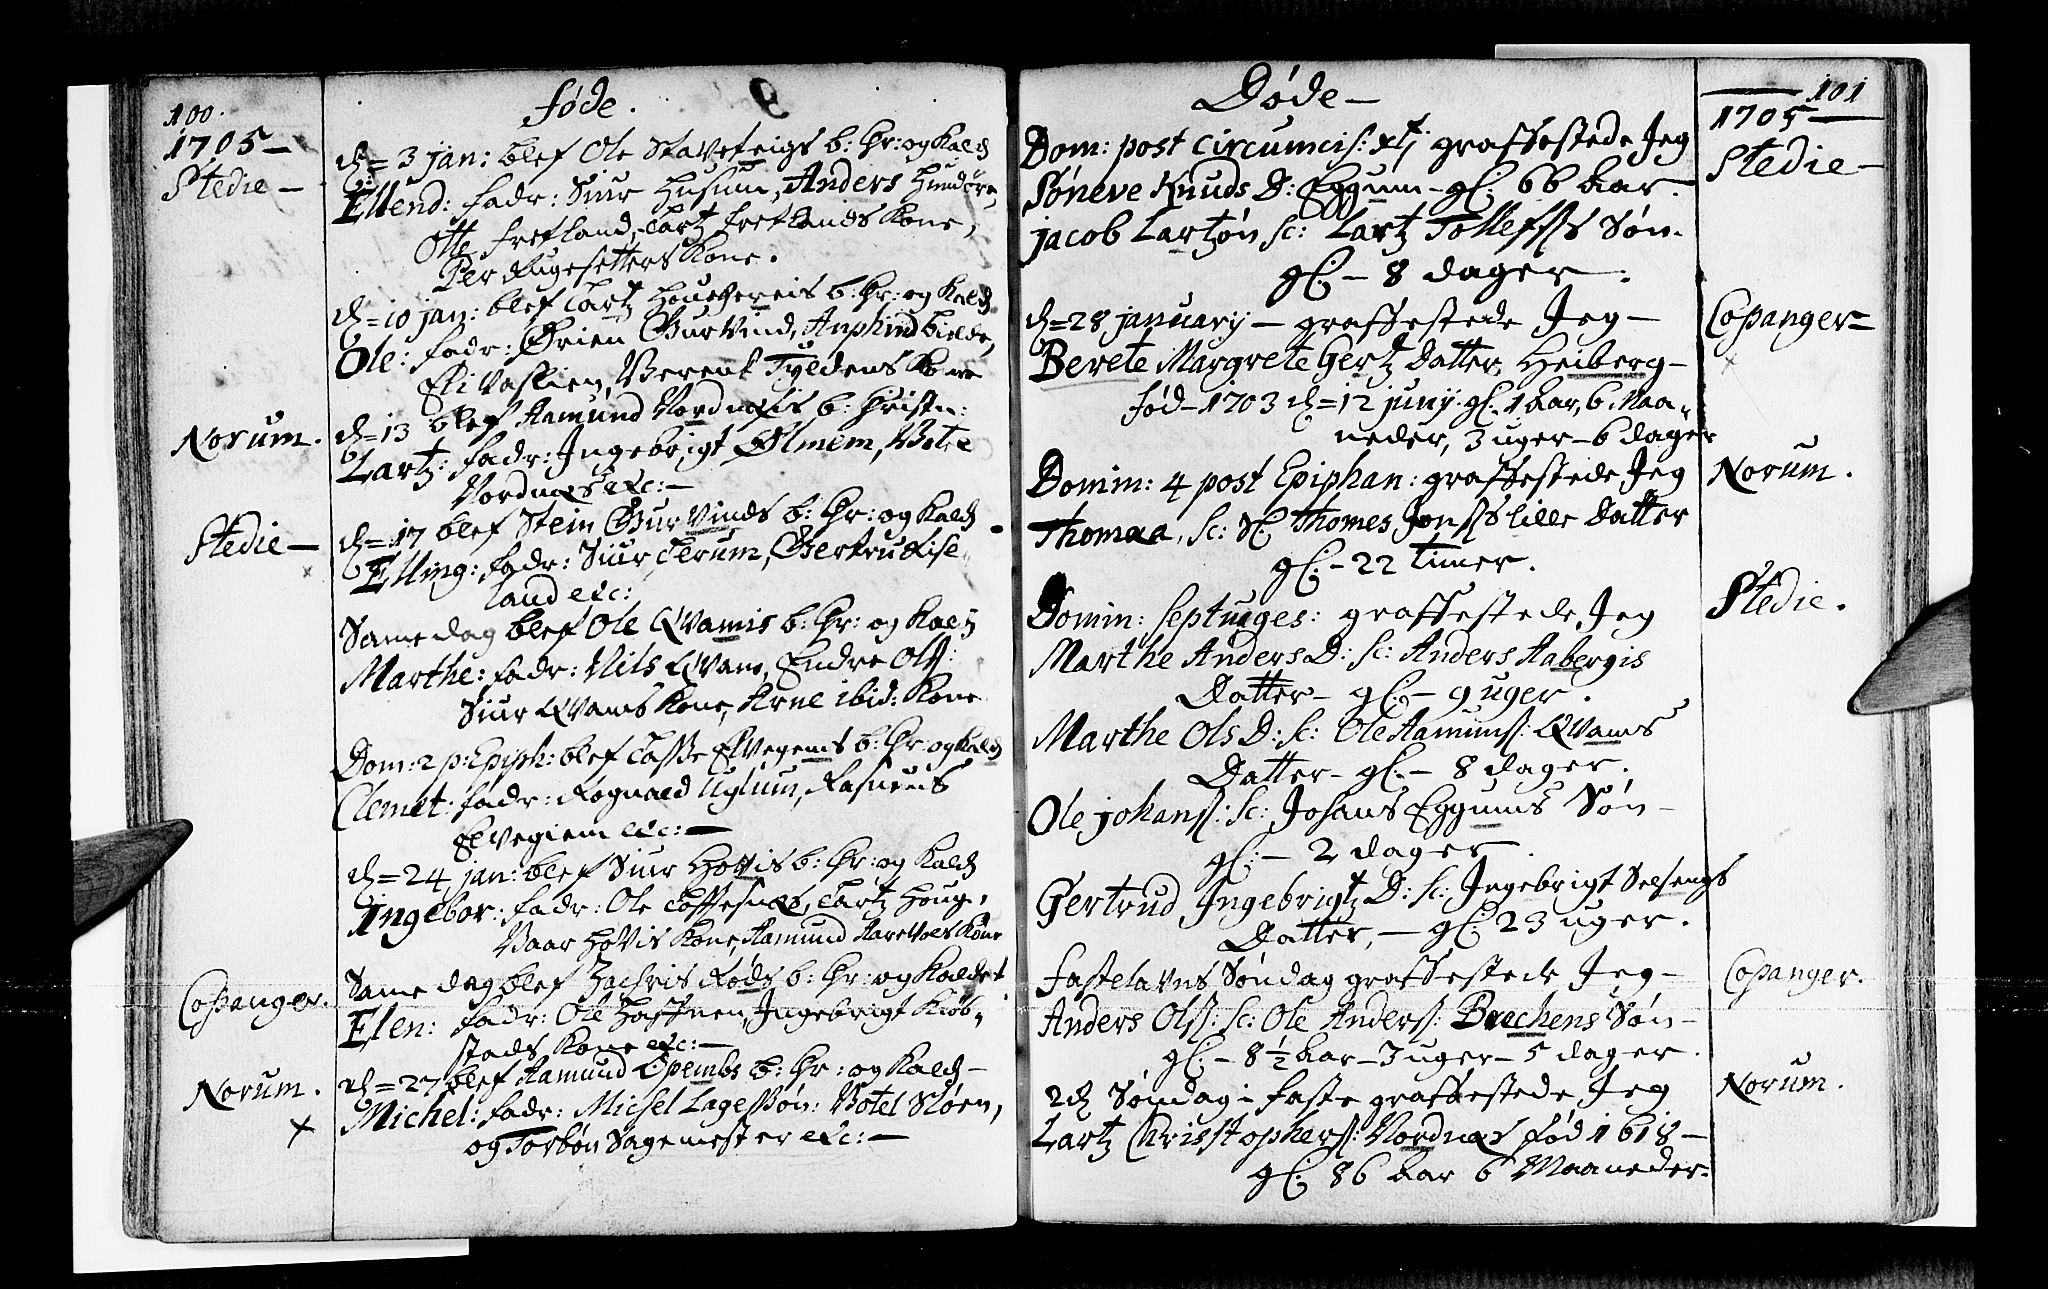 SAB, Sogndal sokneprestembete, H/Haa/Haaa/L0001: Ministerialbok nr. A 1, 1689-1713, s. 100-101